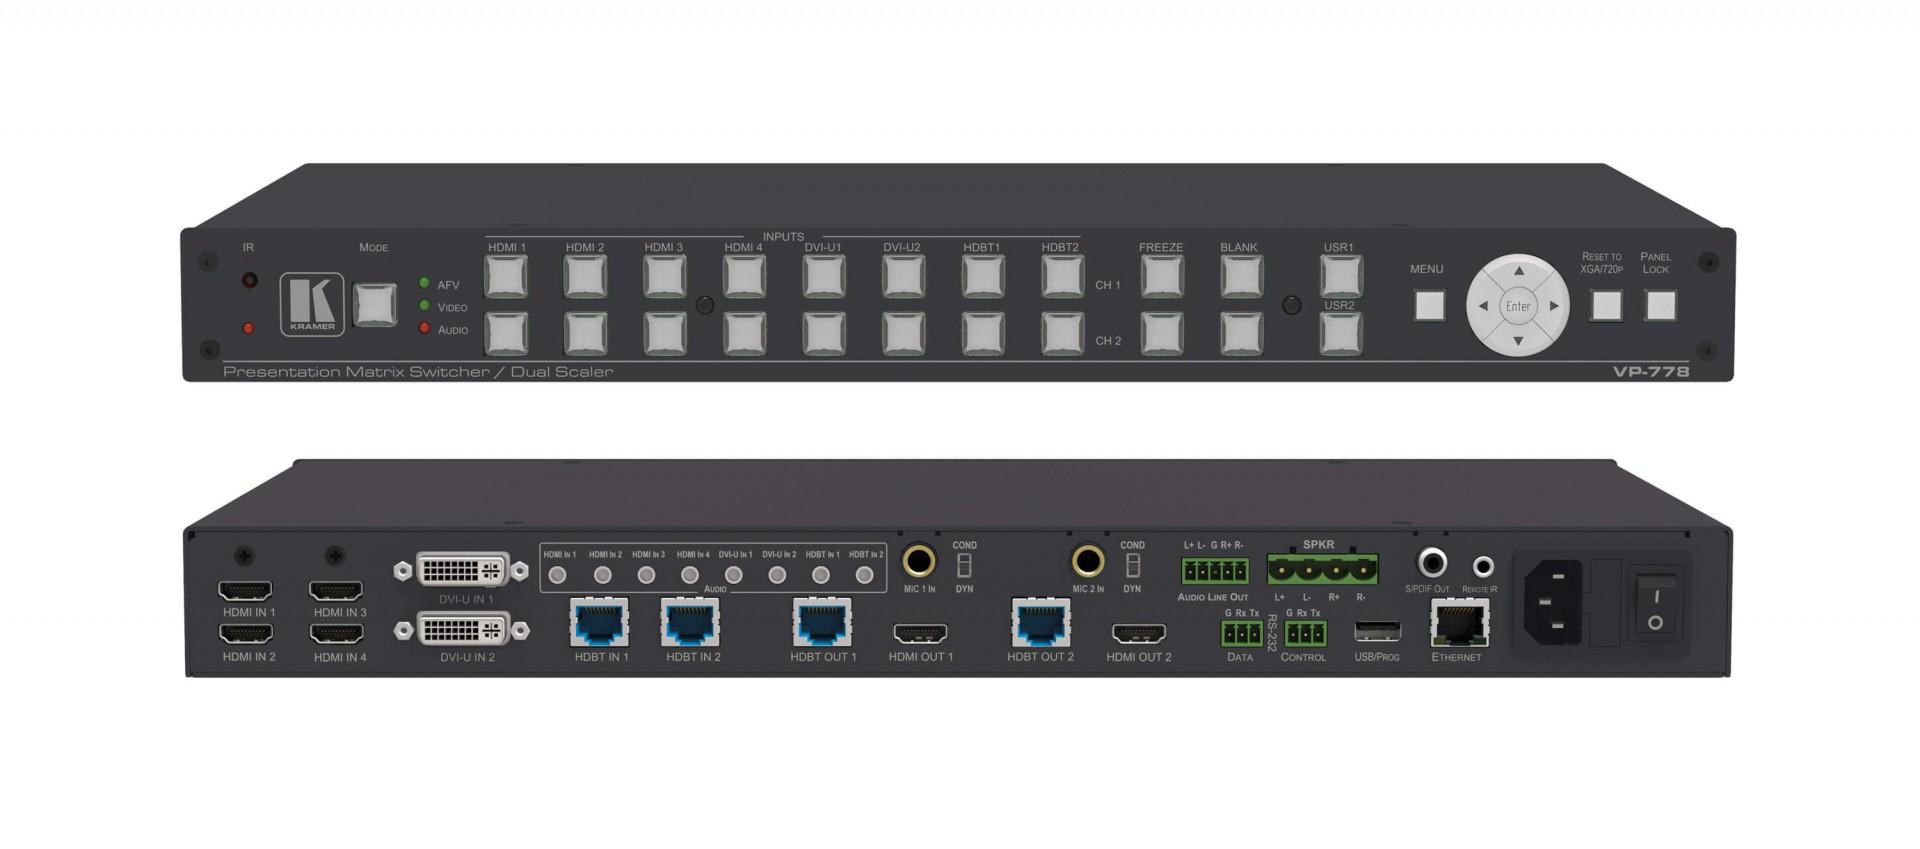 Kramer VP-778 8–Input Presentation Matrix Switcher/Scaler with Seamless Video Cuts and 4K30 Output Support